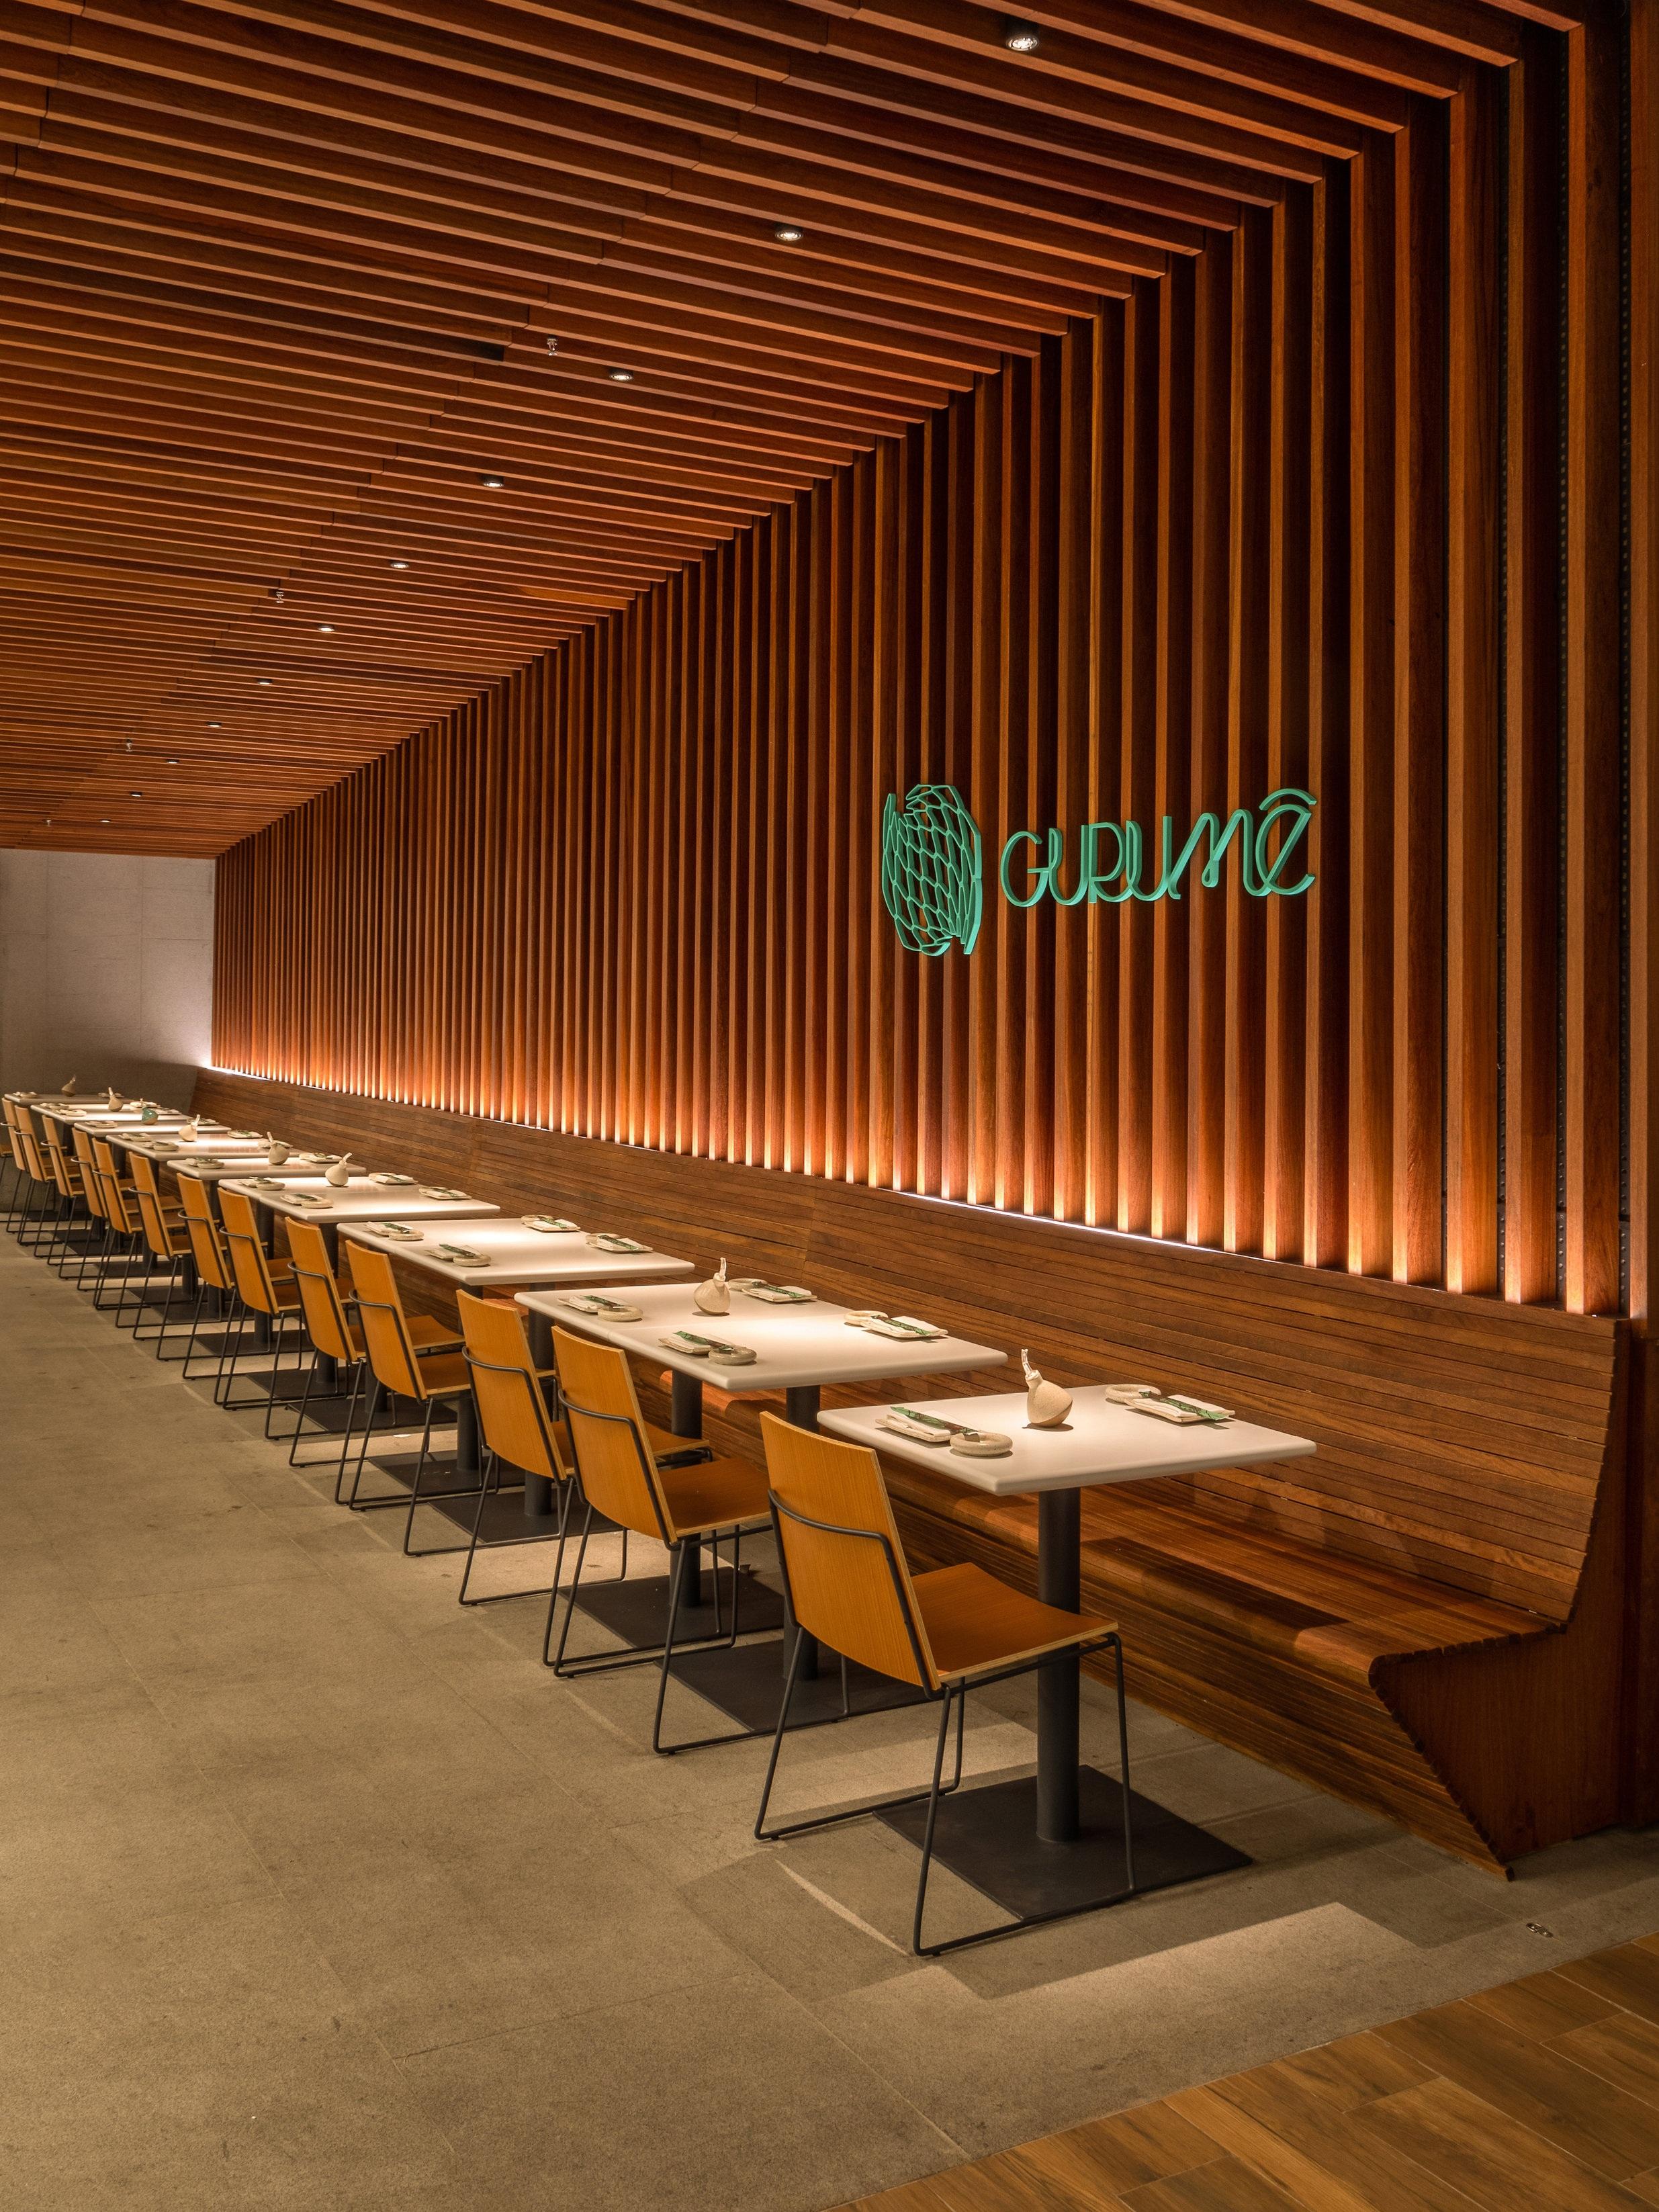 LIGHTSOURCE_Restaurante-Gurume-2019_Bernardes-Arquitetura_Studio-iluz_005.jpg